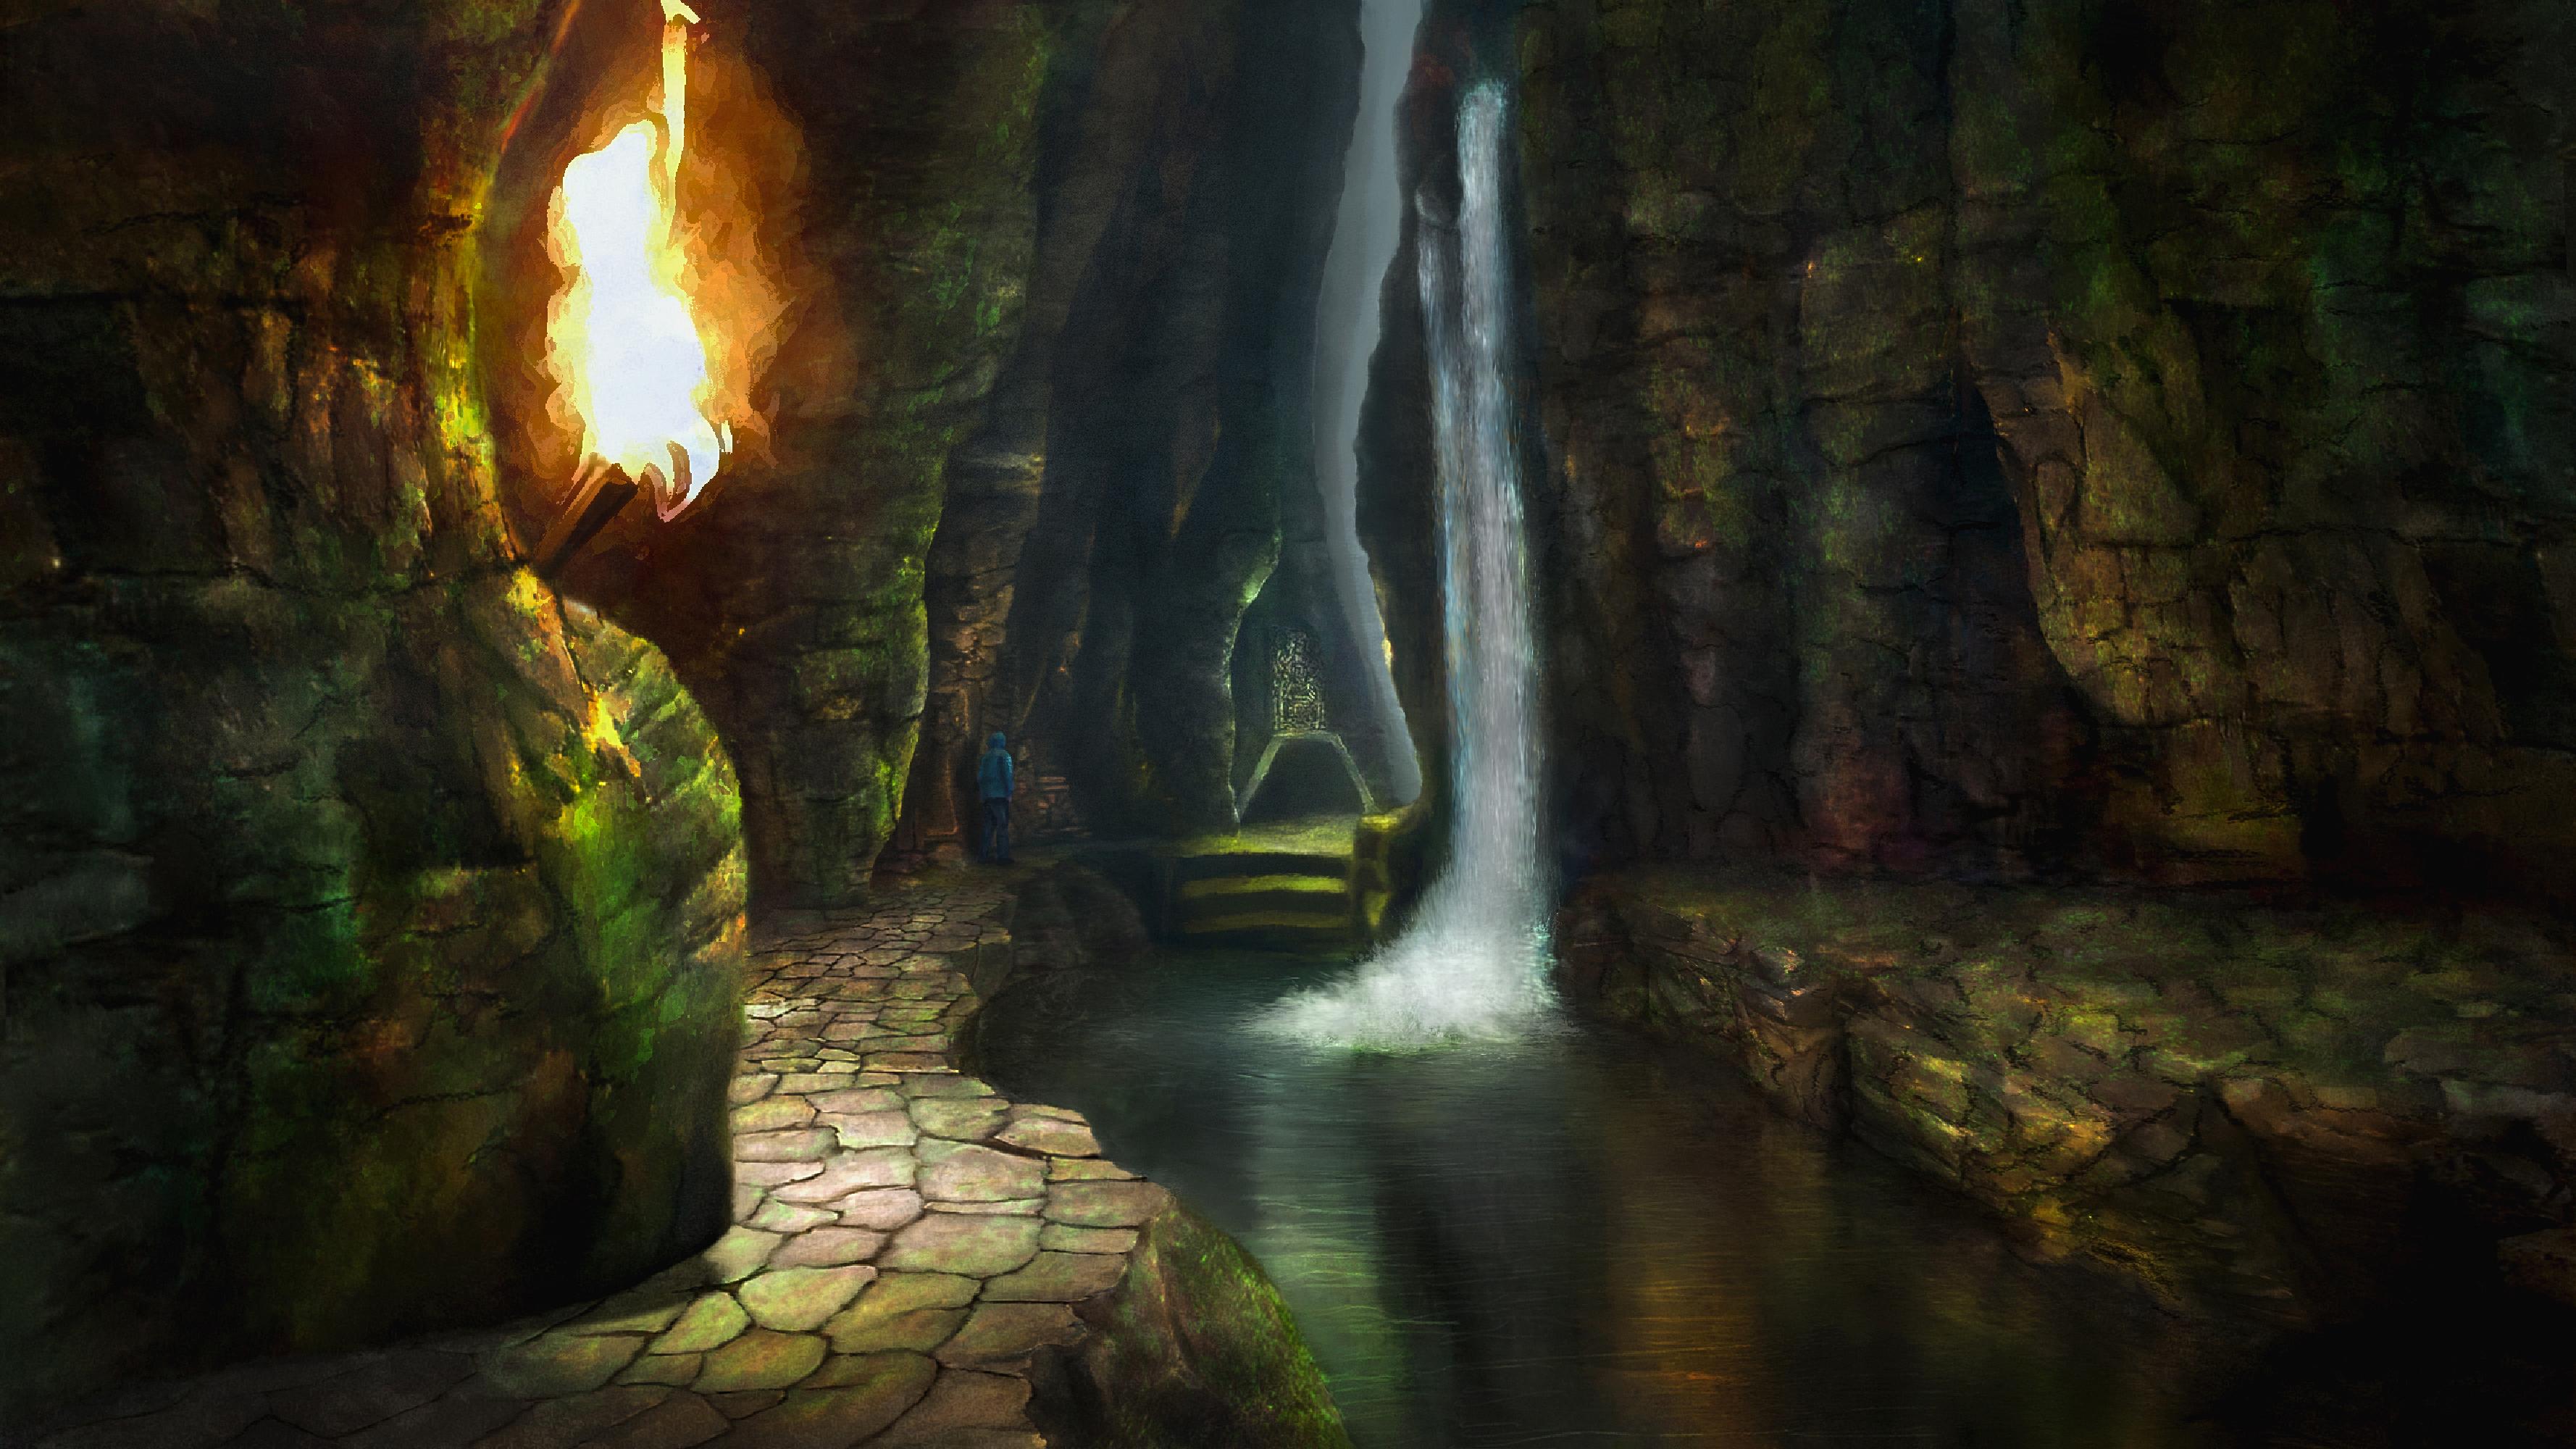 Paul Plays Minecraft - Ep44 Portal to Xibalba - The Underground (Snapshot 3:26)